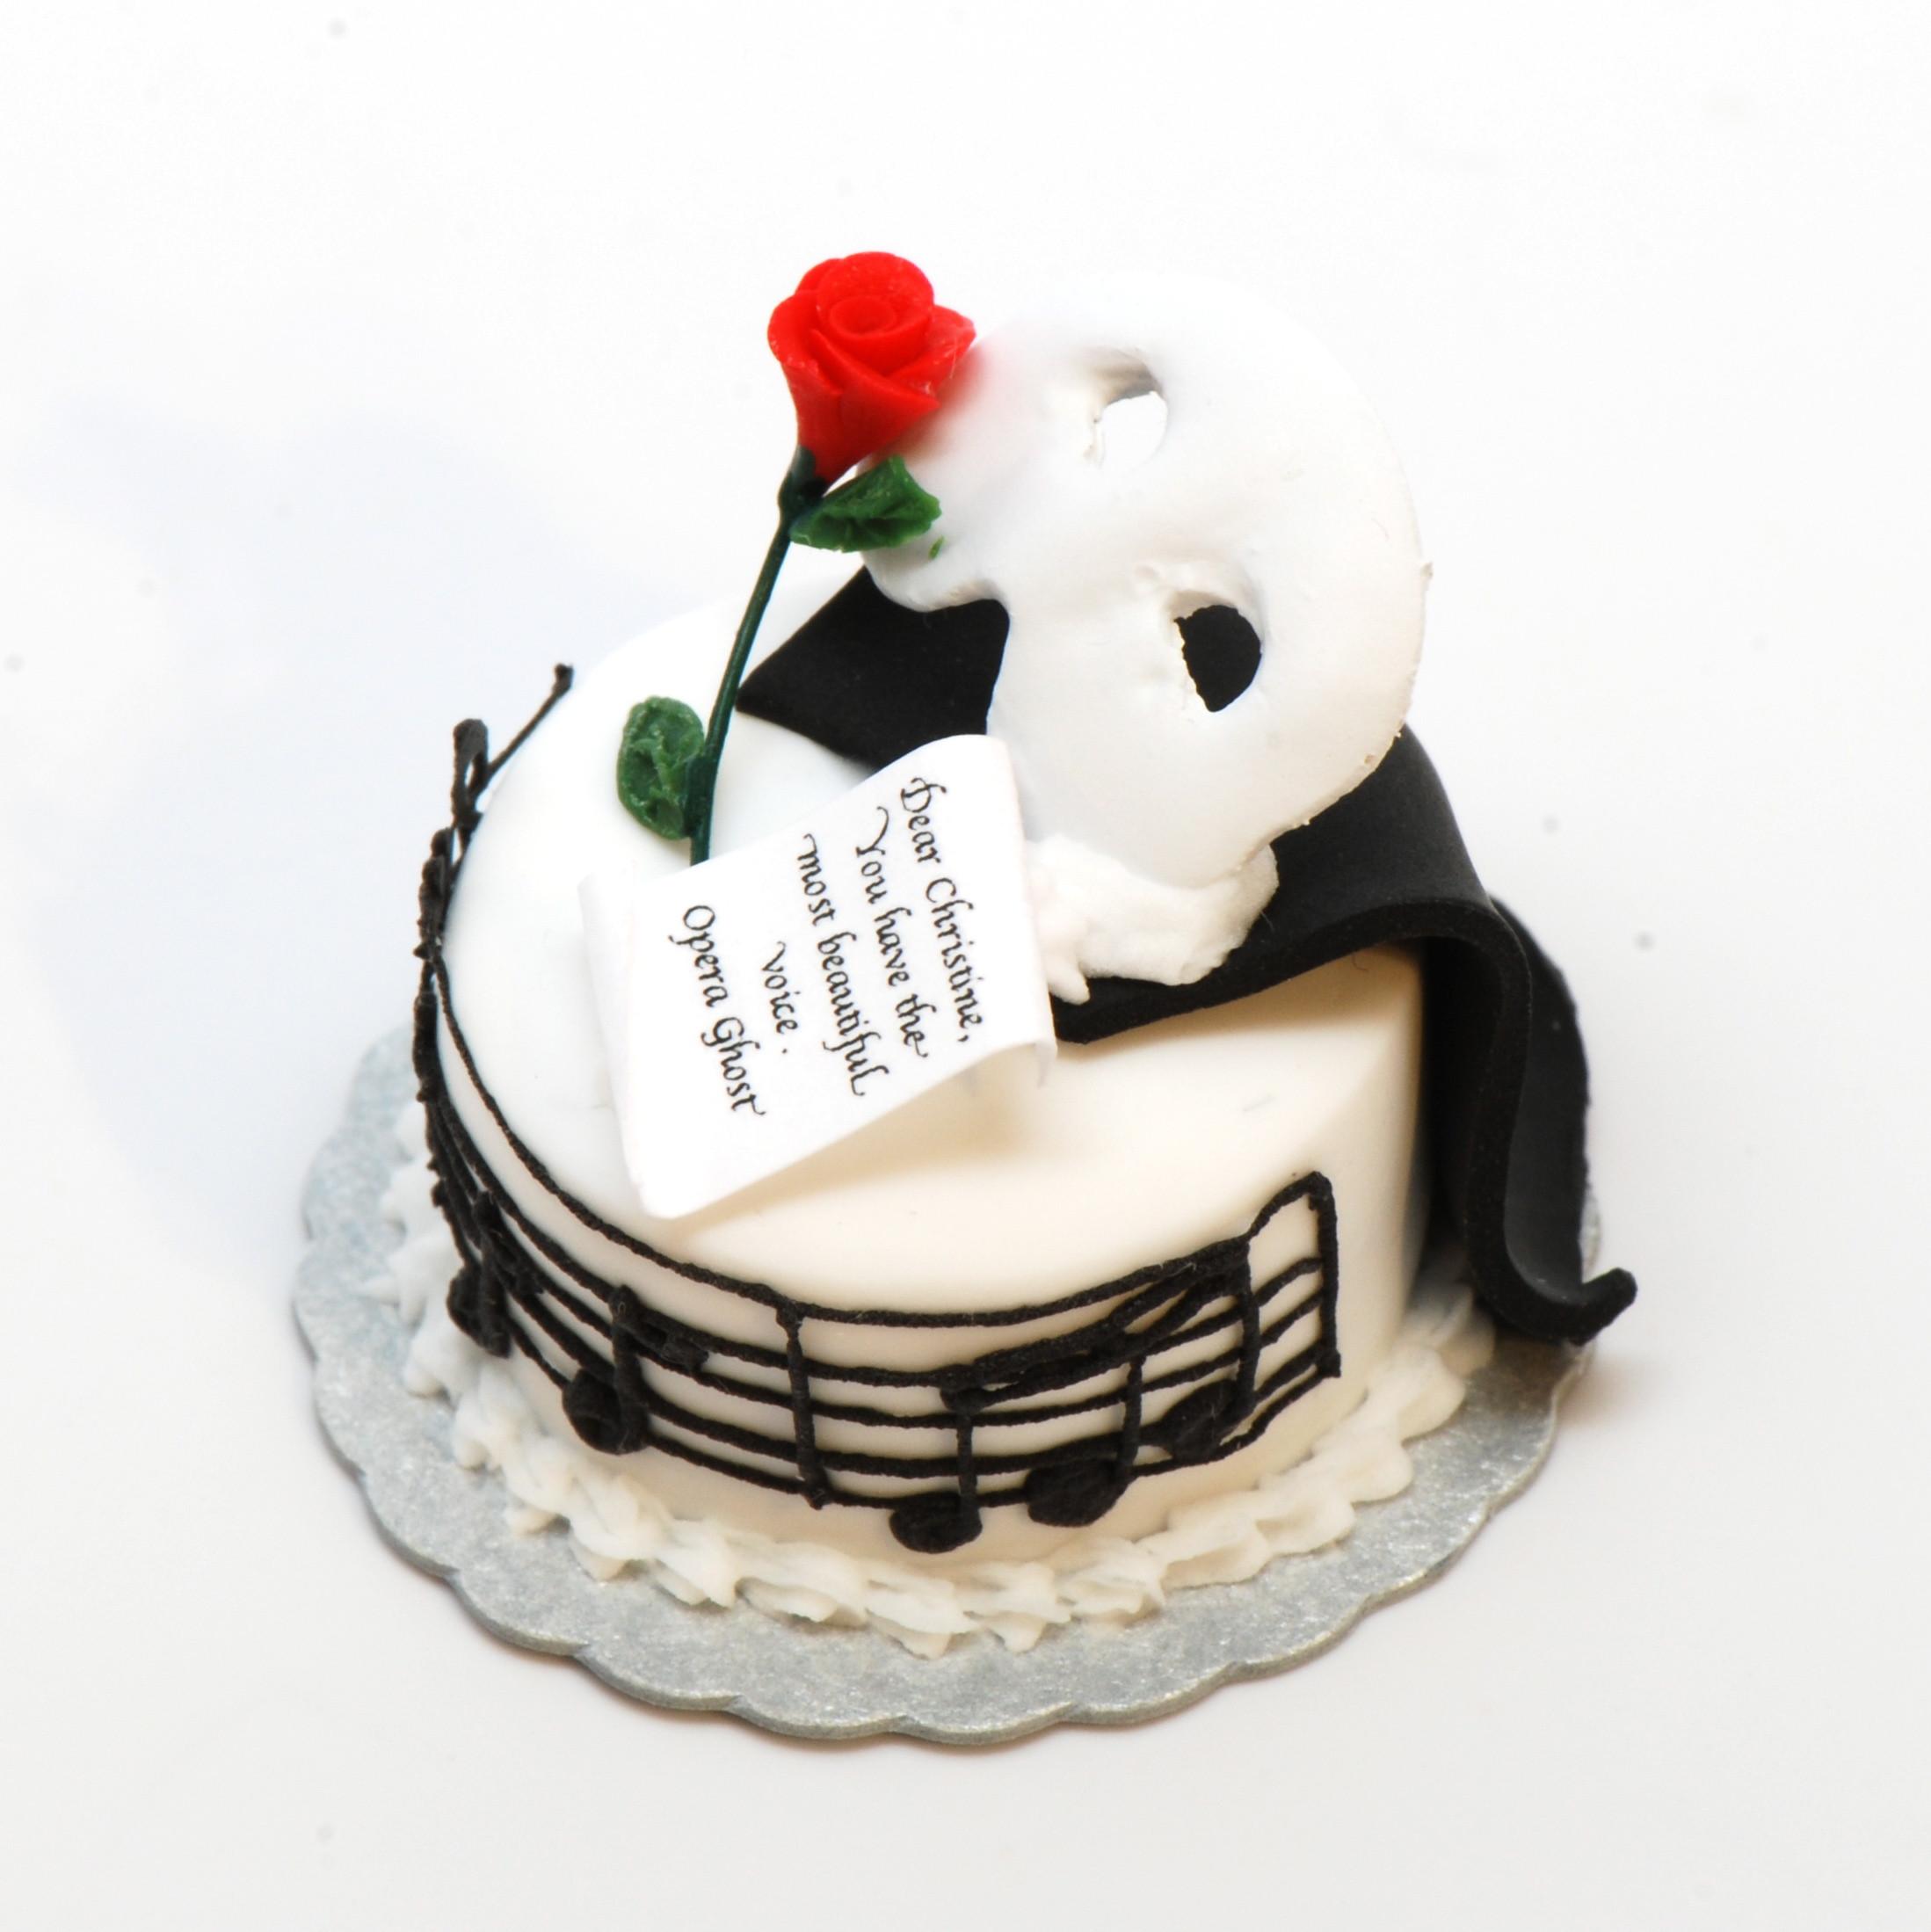 Wedding Cakes Catalogs  Free Wedding Cake Ideas Catalogs